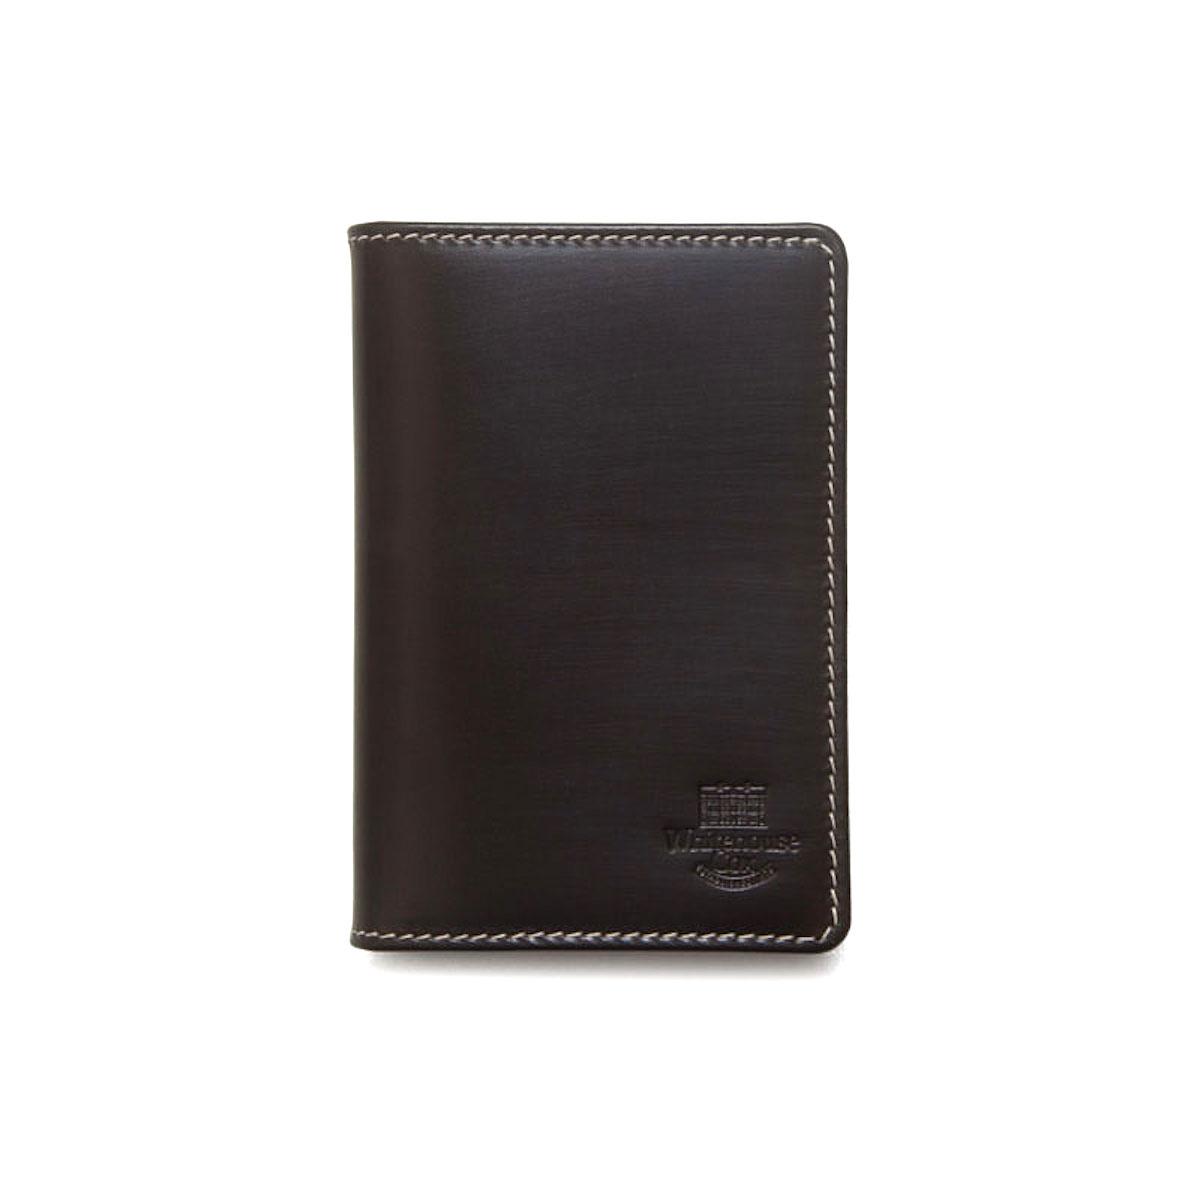 WHITEHOUSE COX / S7412 NAME CARD CASE (Espresso×Yellow)